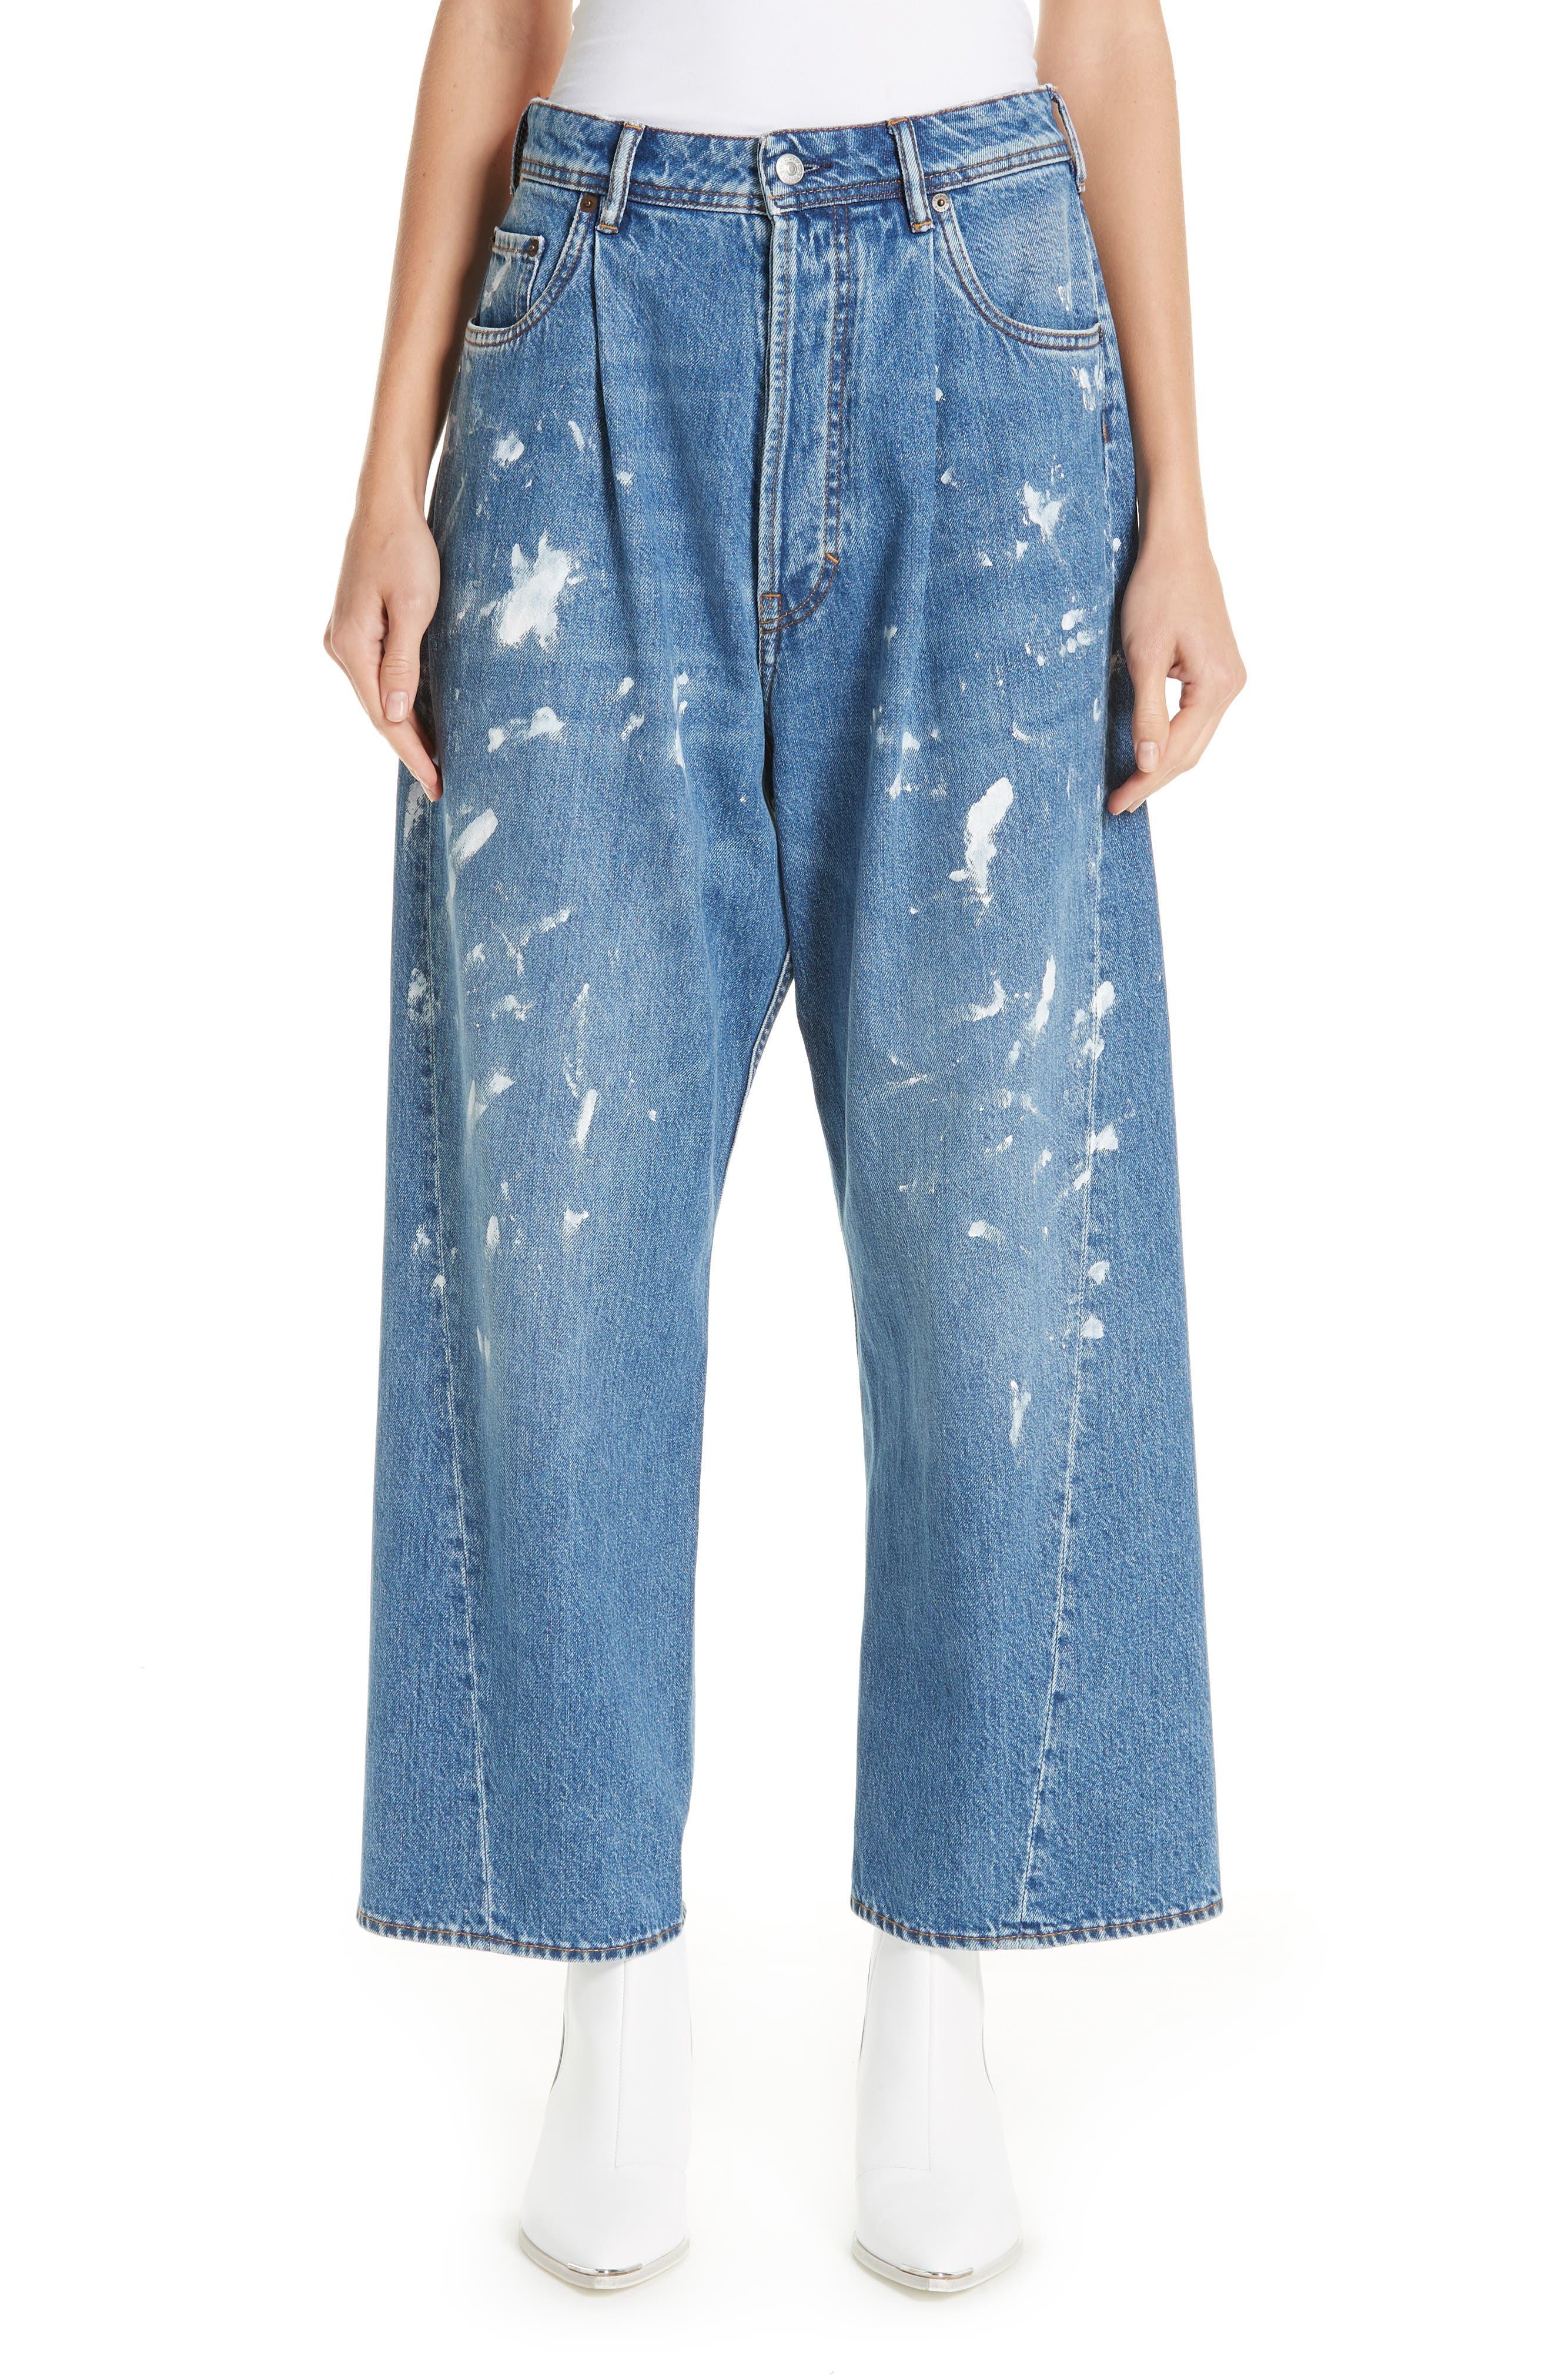 ACNE STUDIOS Oversized Jeans, Main, color, 400